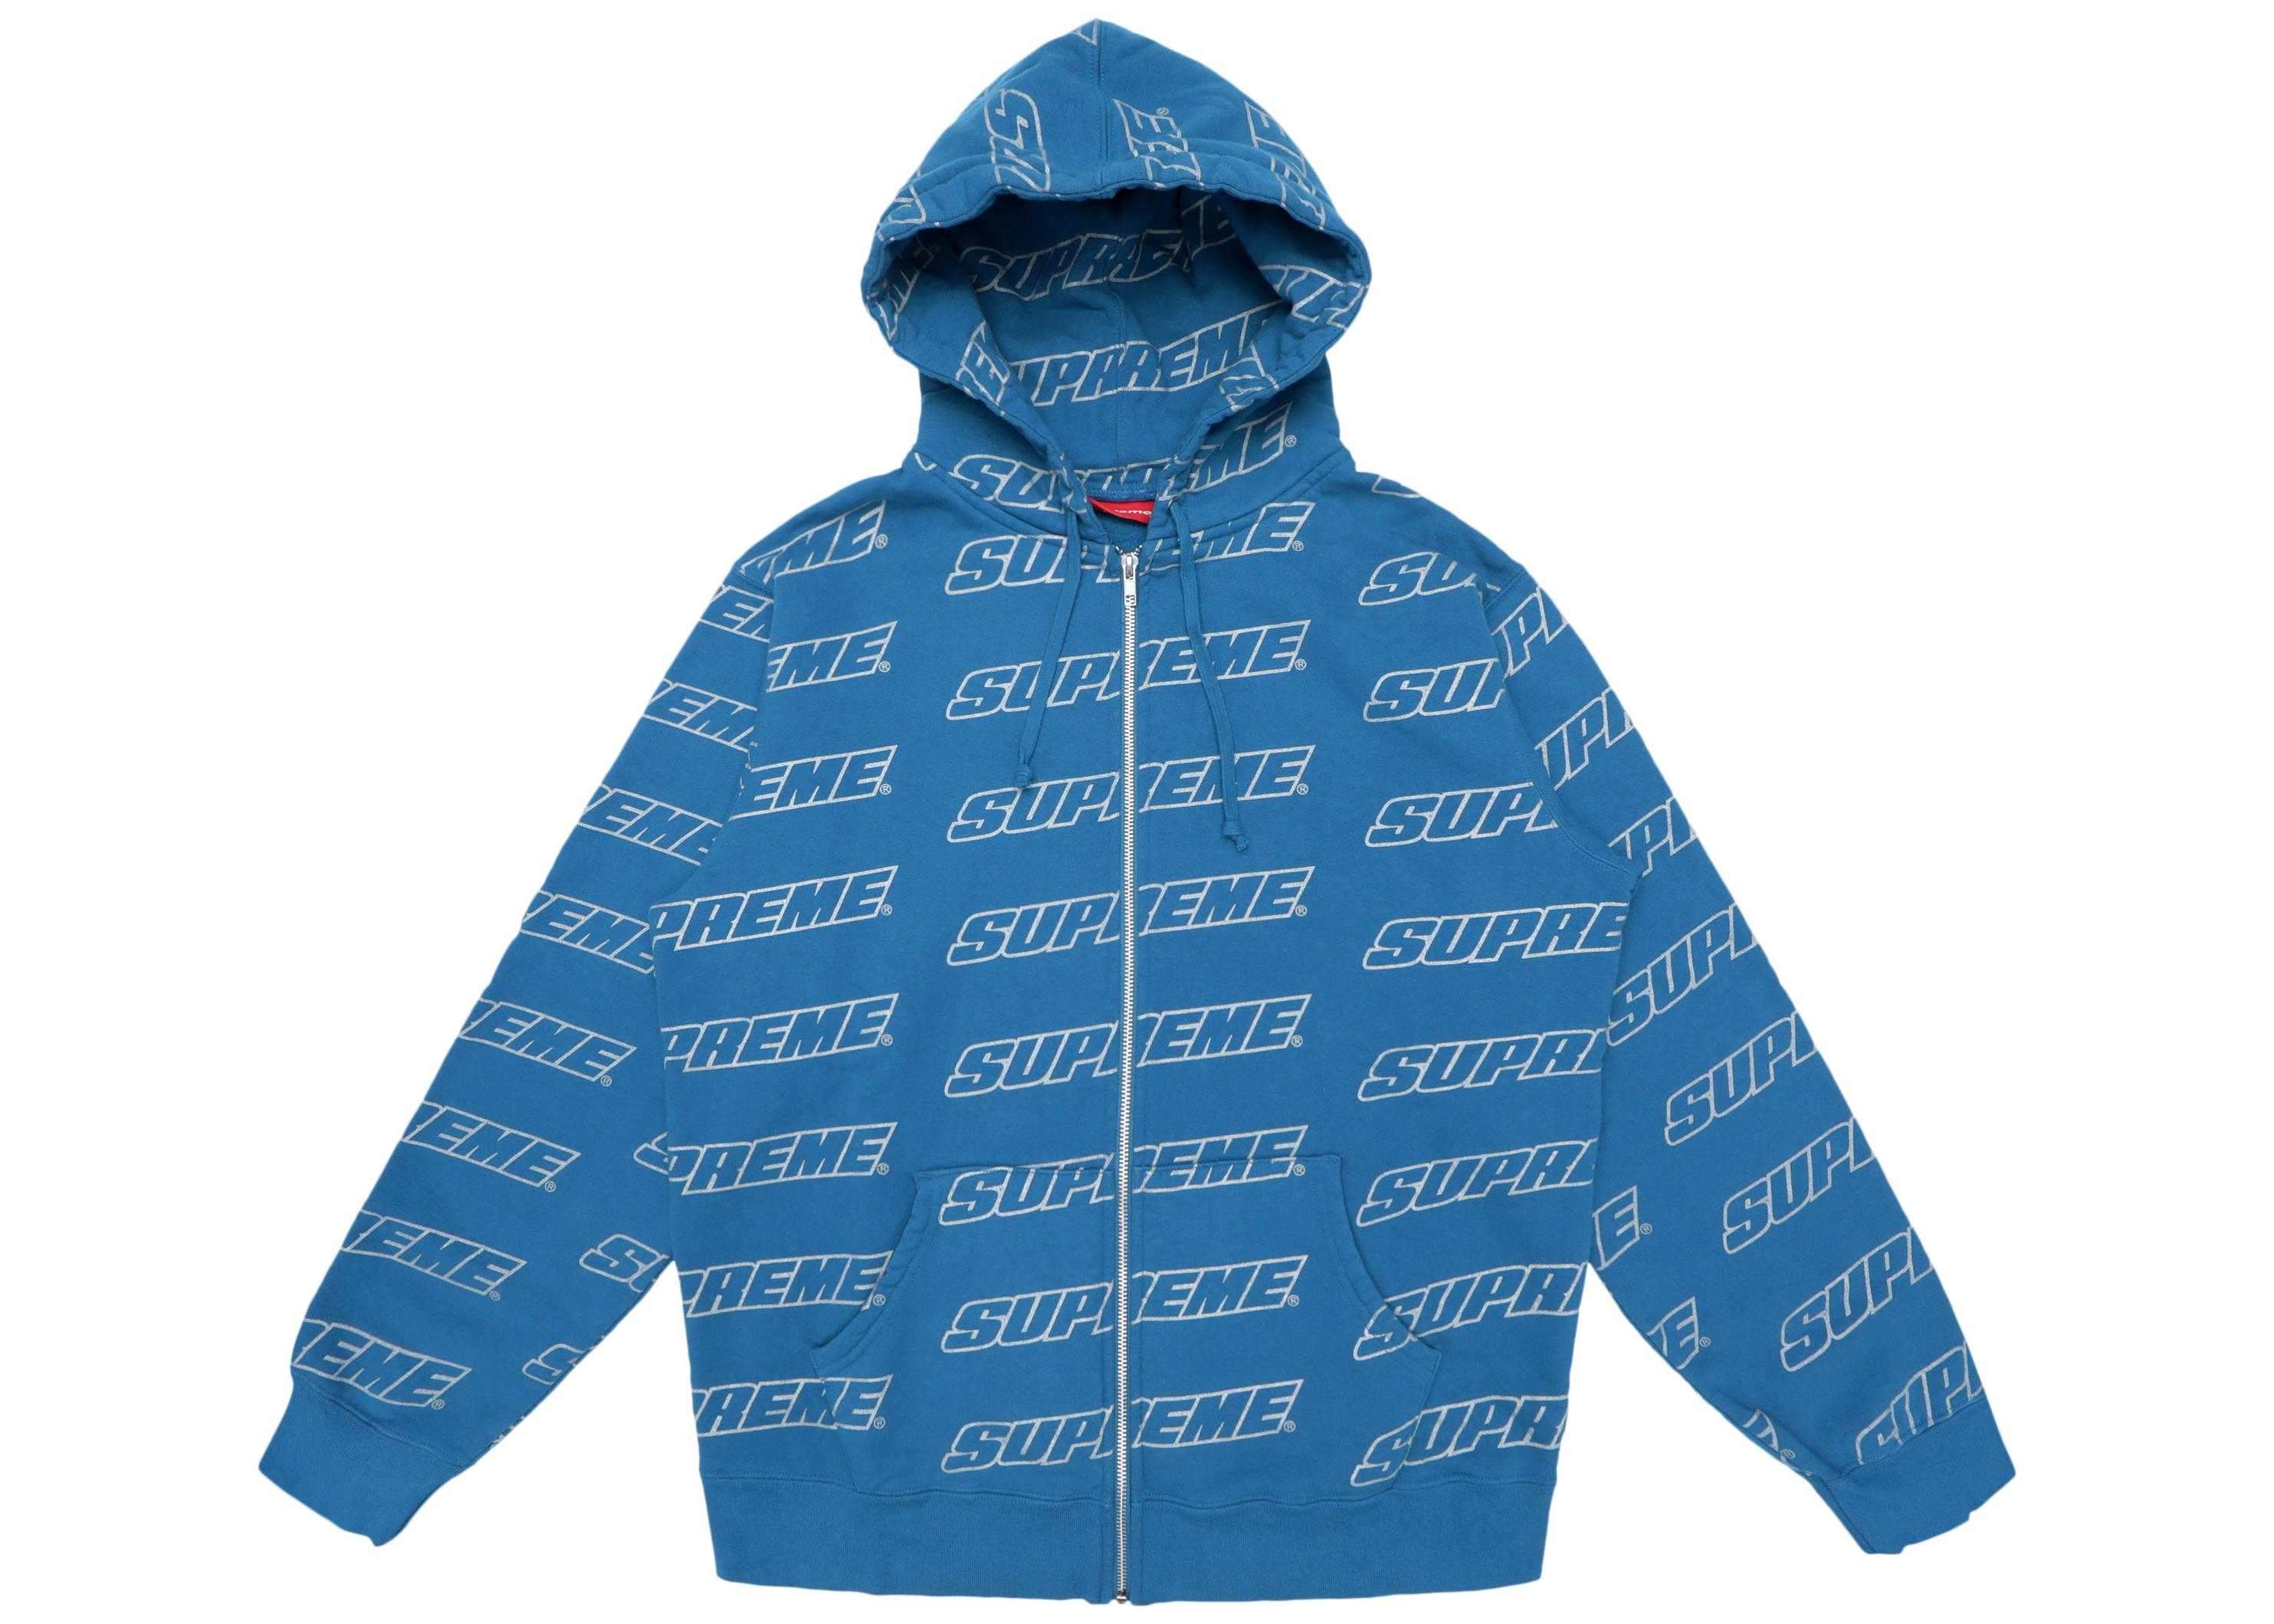 54d8654a Lyst - Supreme Repeat Zip Up Hooded Sweatshirt Dark Aqua in Blue for Men